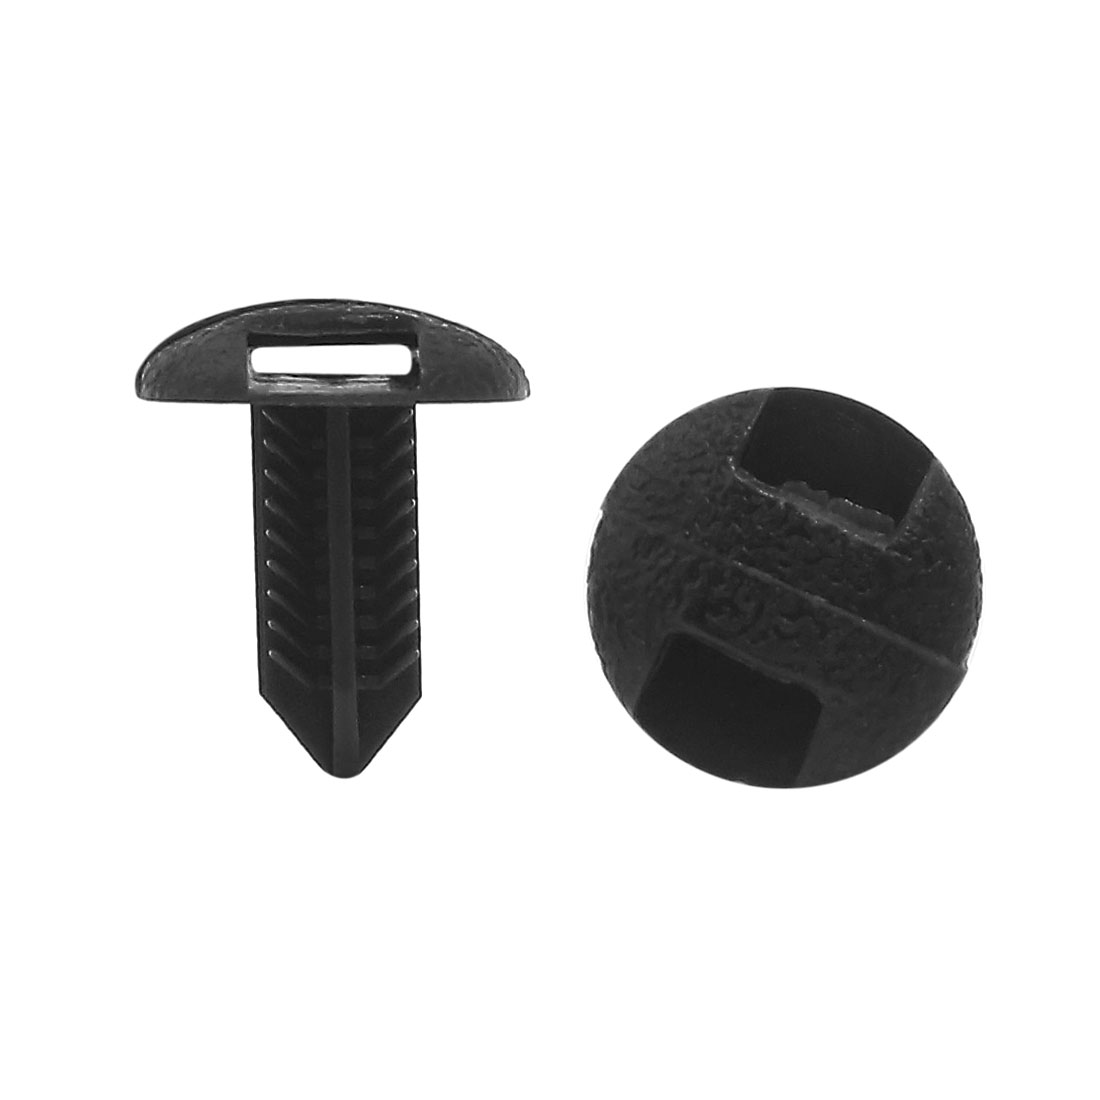 50 Pcs 7 x 6mm Hole Dia Black Plastic Rivets Retainer Clips for Car Bumper Fender